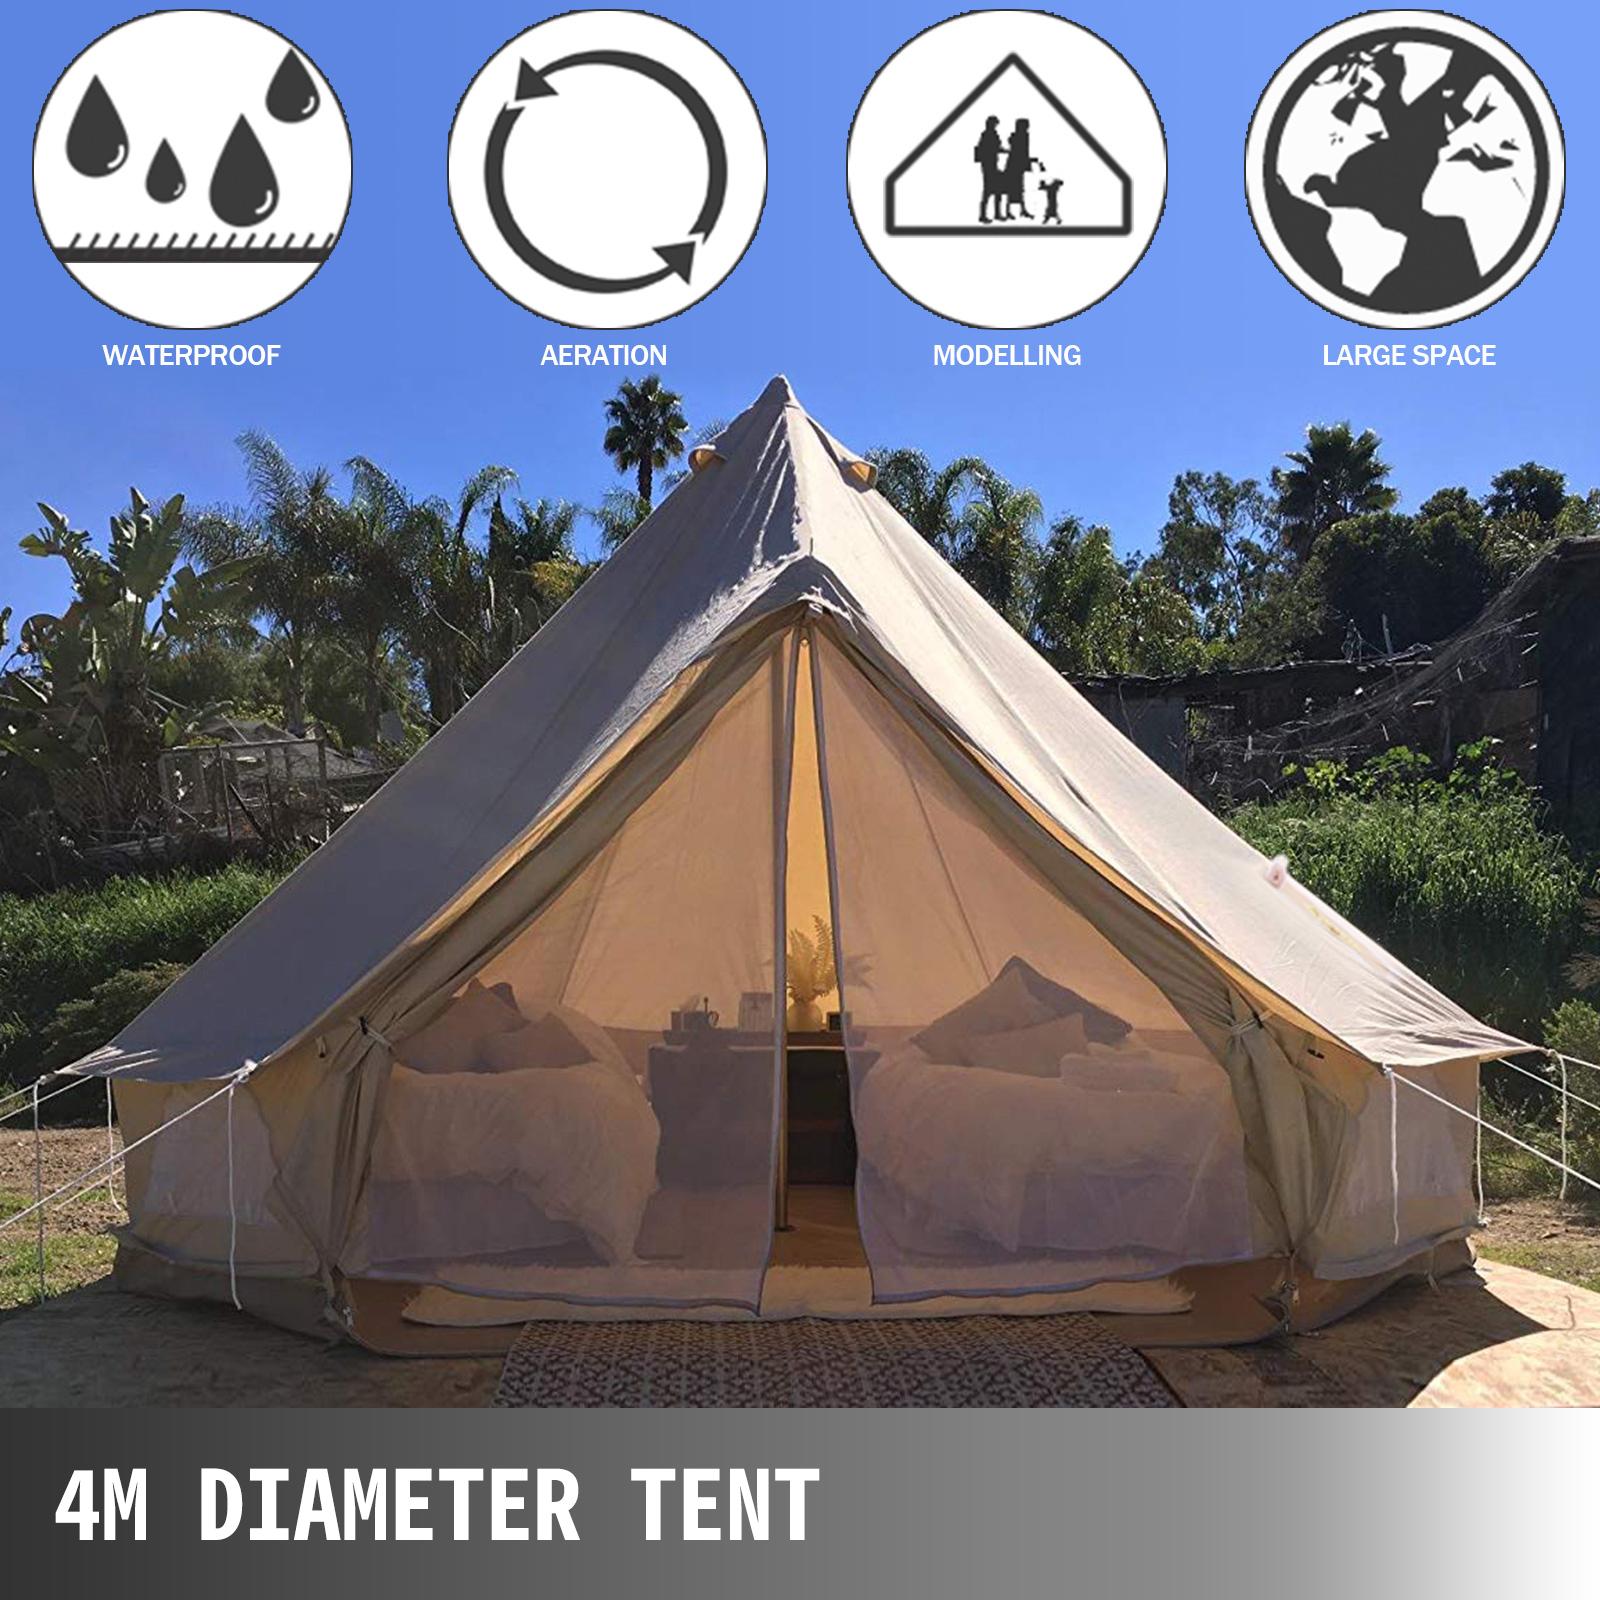 4-Season-Bell-Tent-3-4-5-6M-Waterproof-Cotton-Canvas-Glamping-Camping-Beach-US thumbnail 28